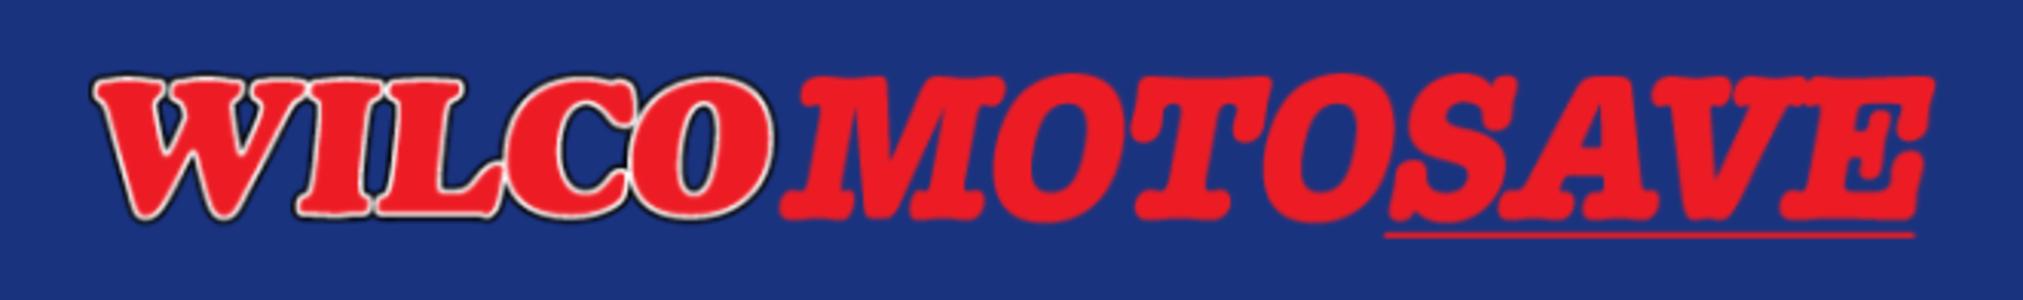 Wilco Motosave - Castleford